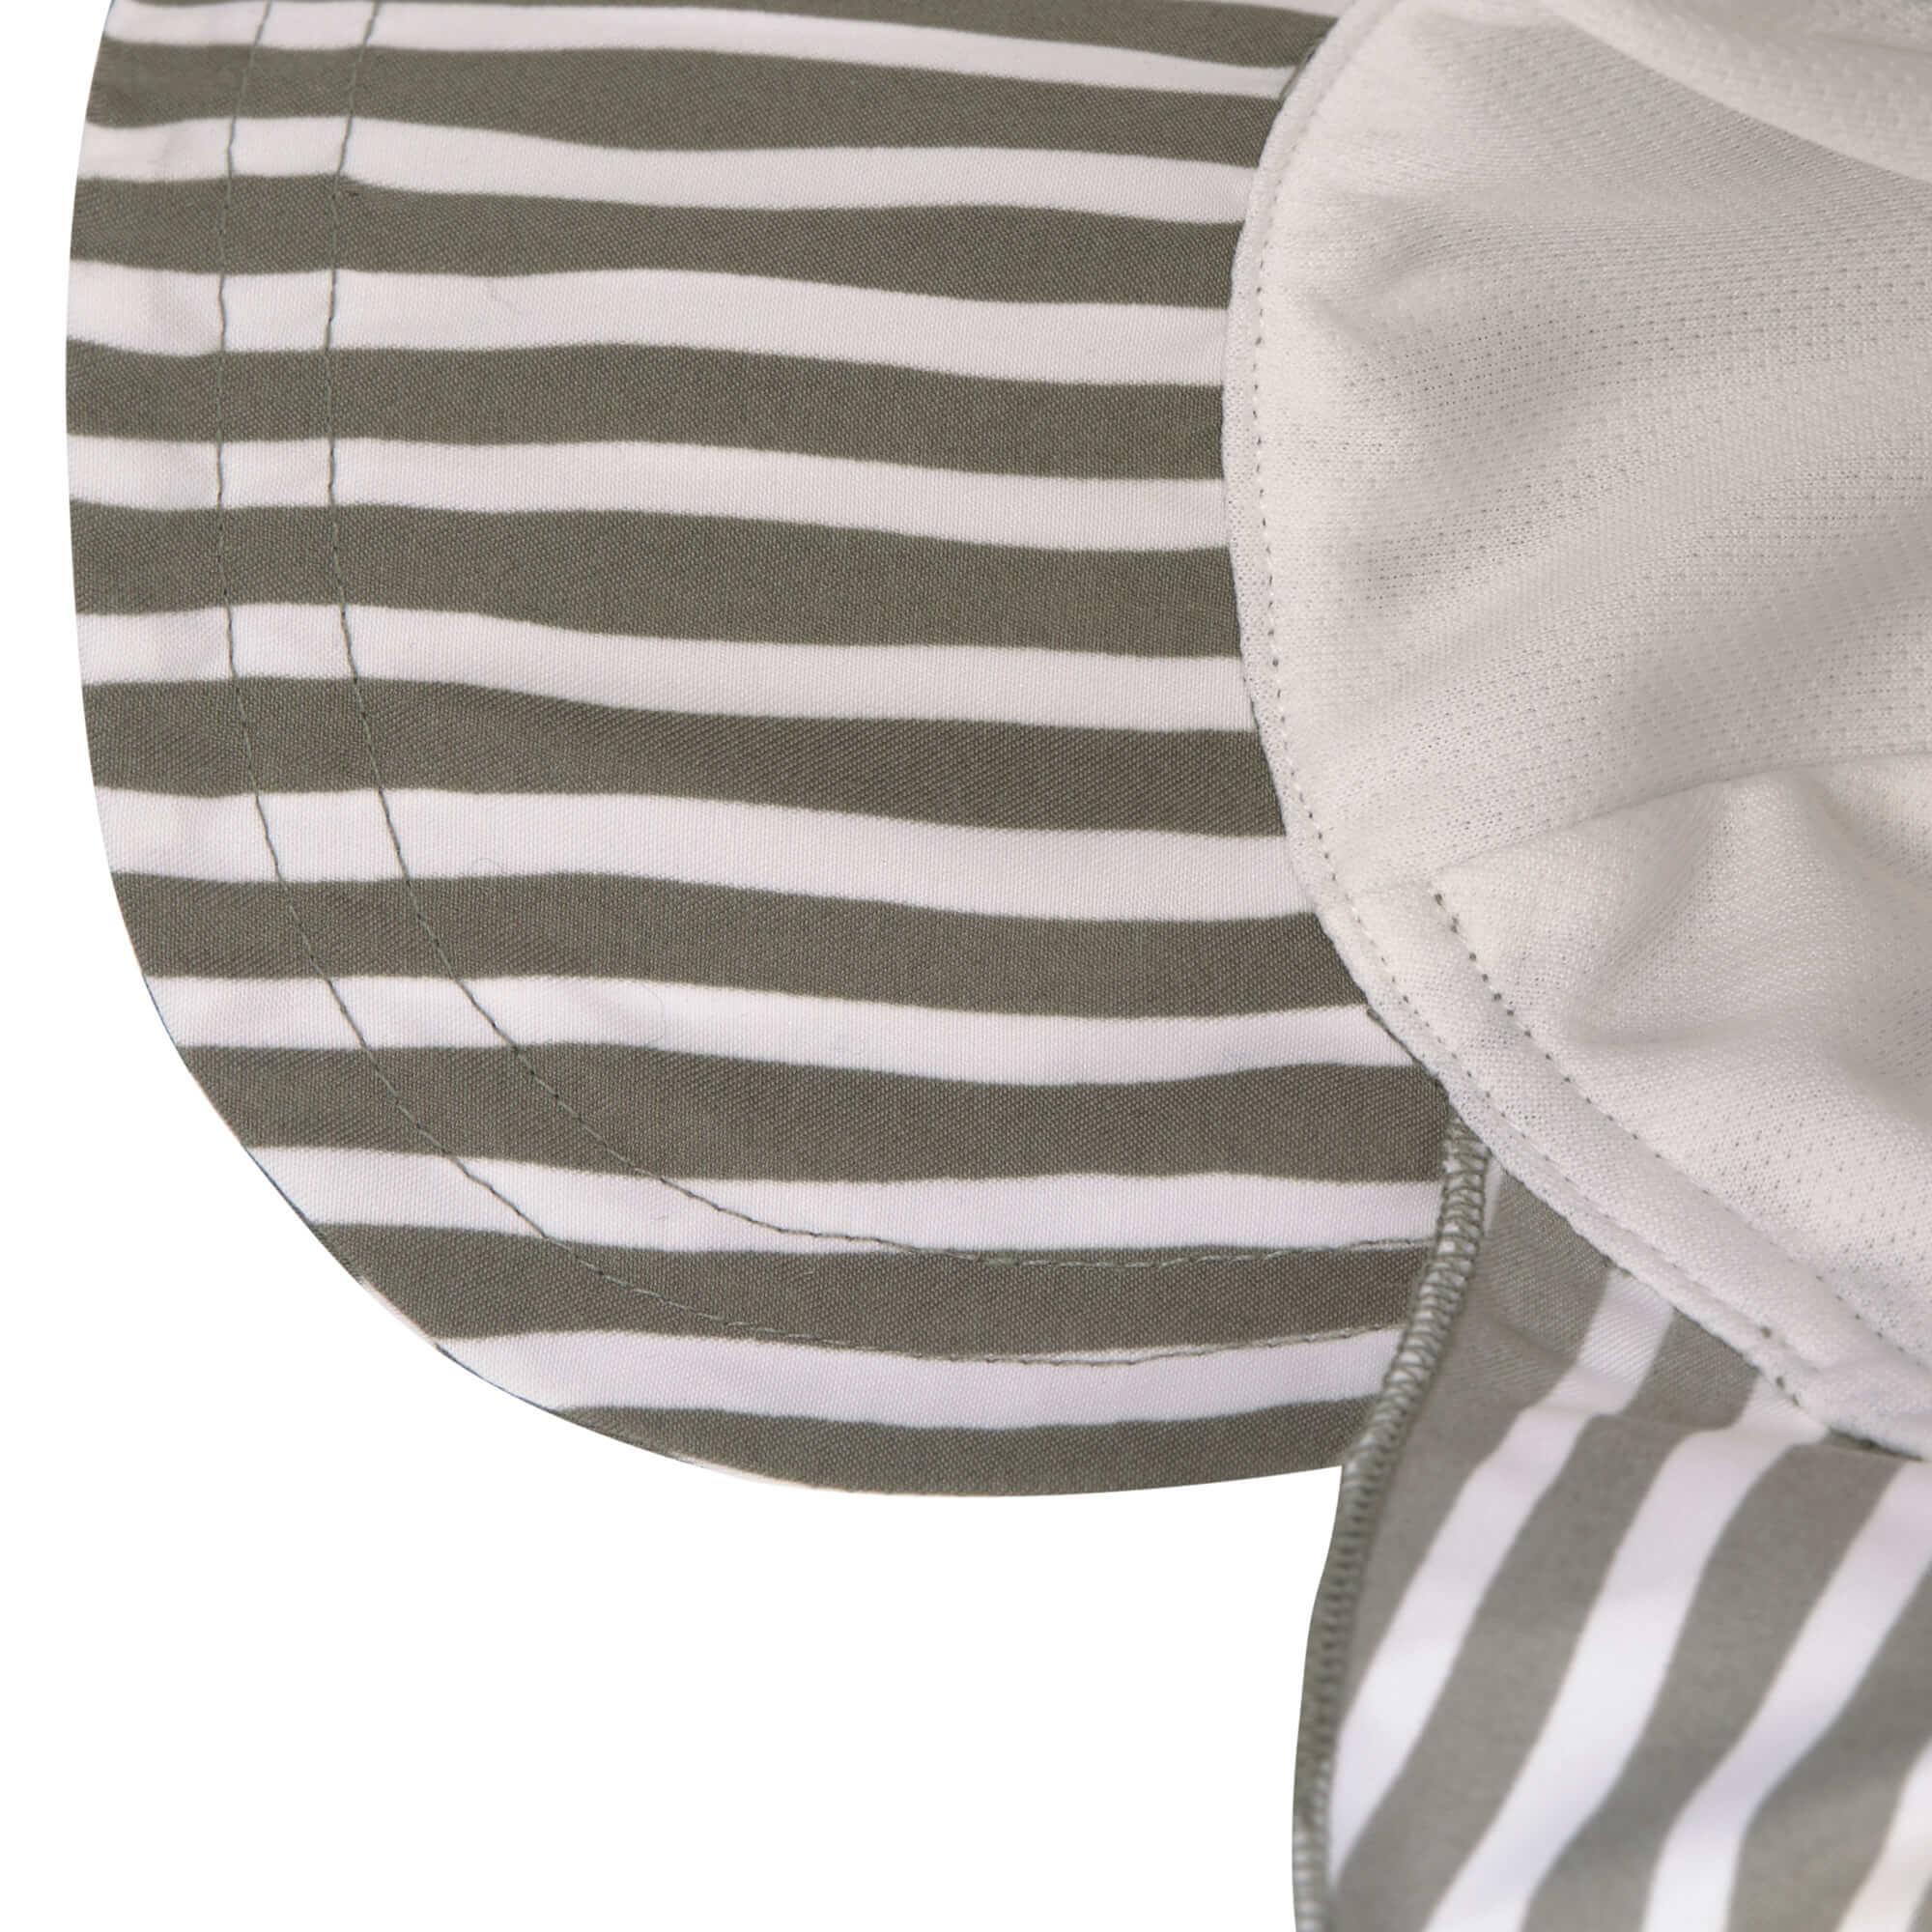 Lässig Lässig Splash & Fun Sun Protection Zonnehoed Flaphoed met UV bescherming - Stripes olive 19-36 maanden, Maat: 50/51